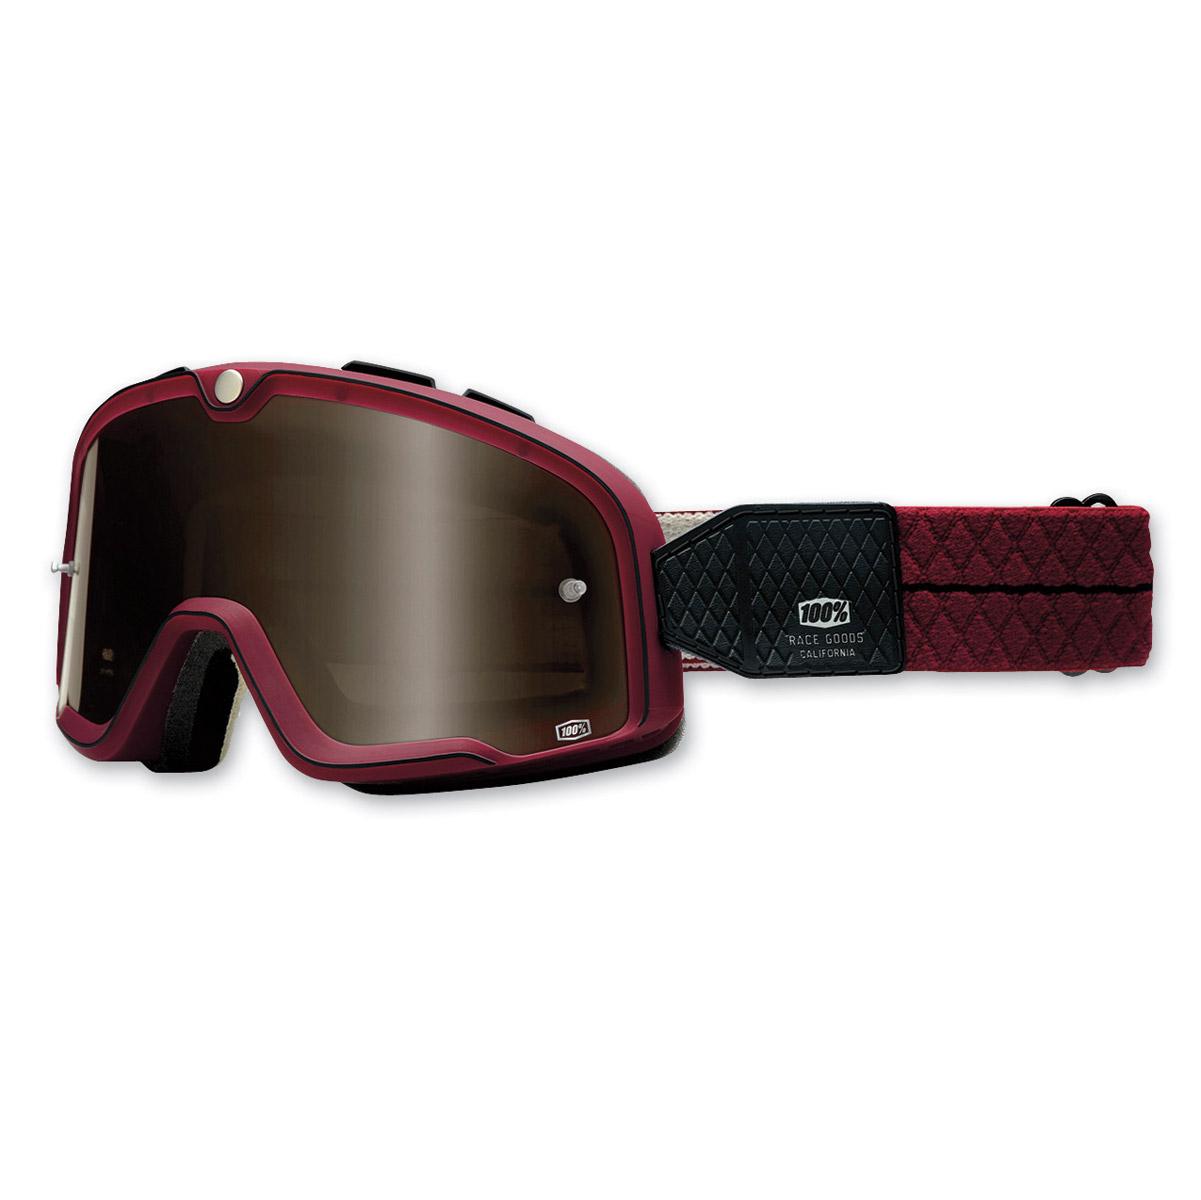 100% Barstow Burgundy Legend Goggles